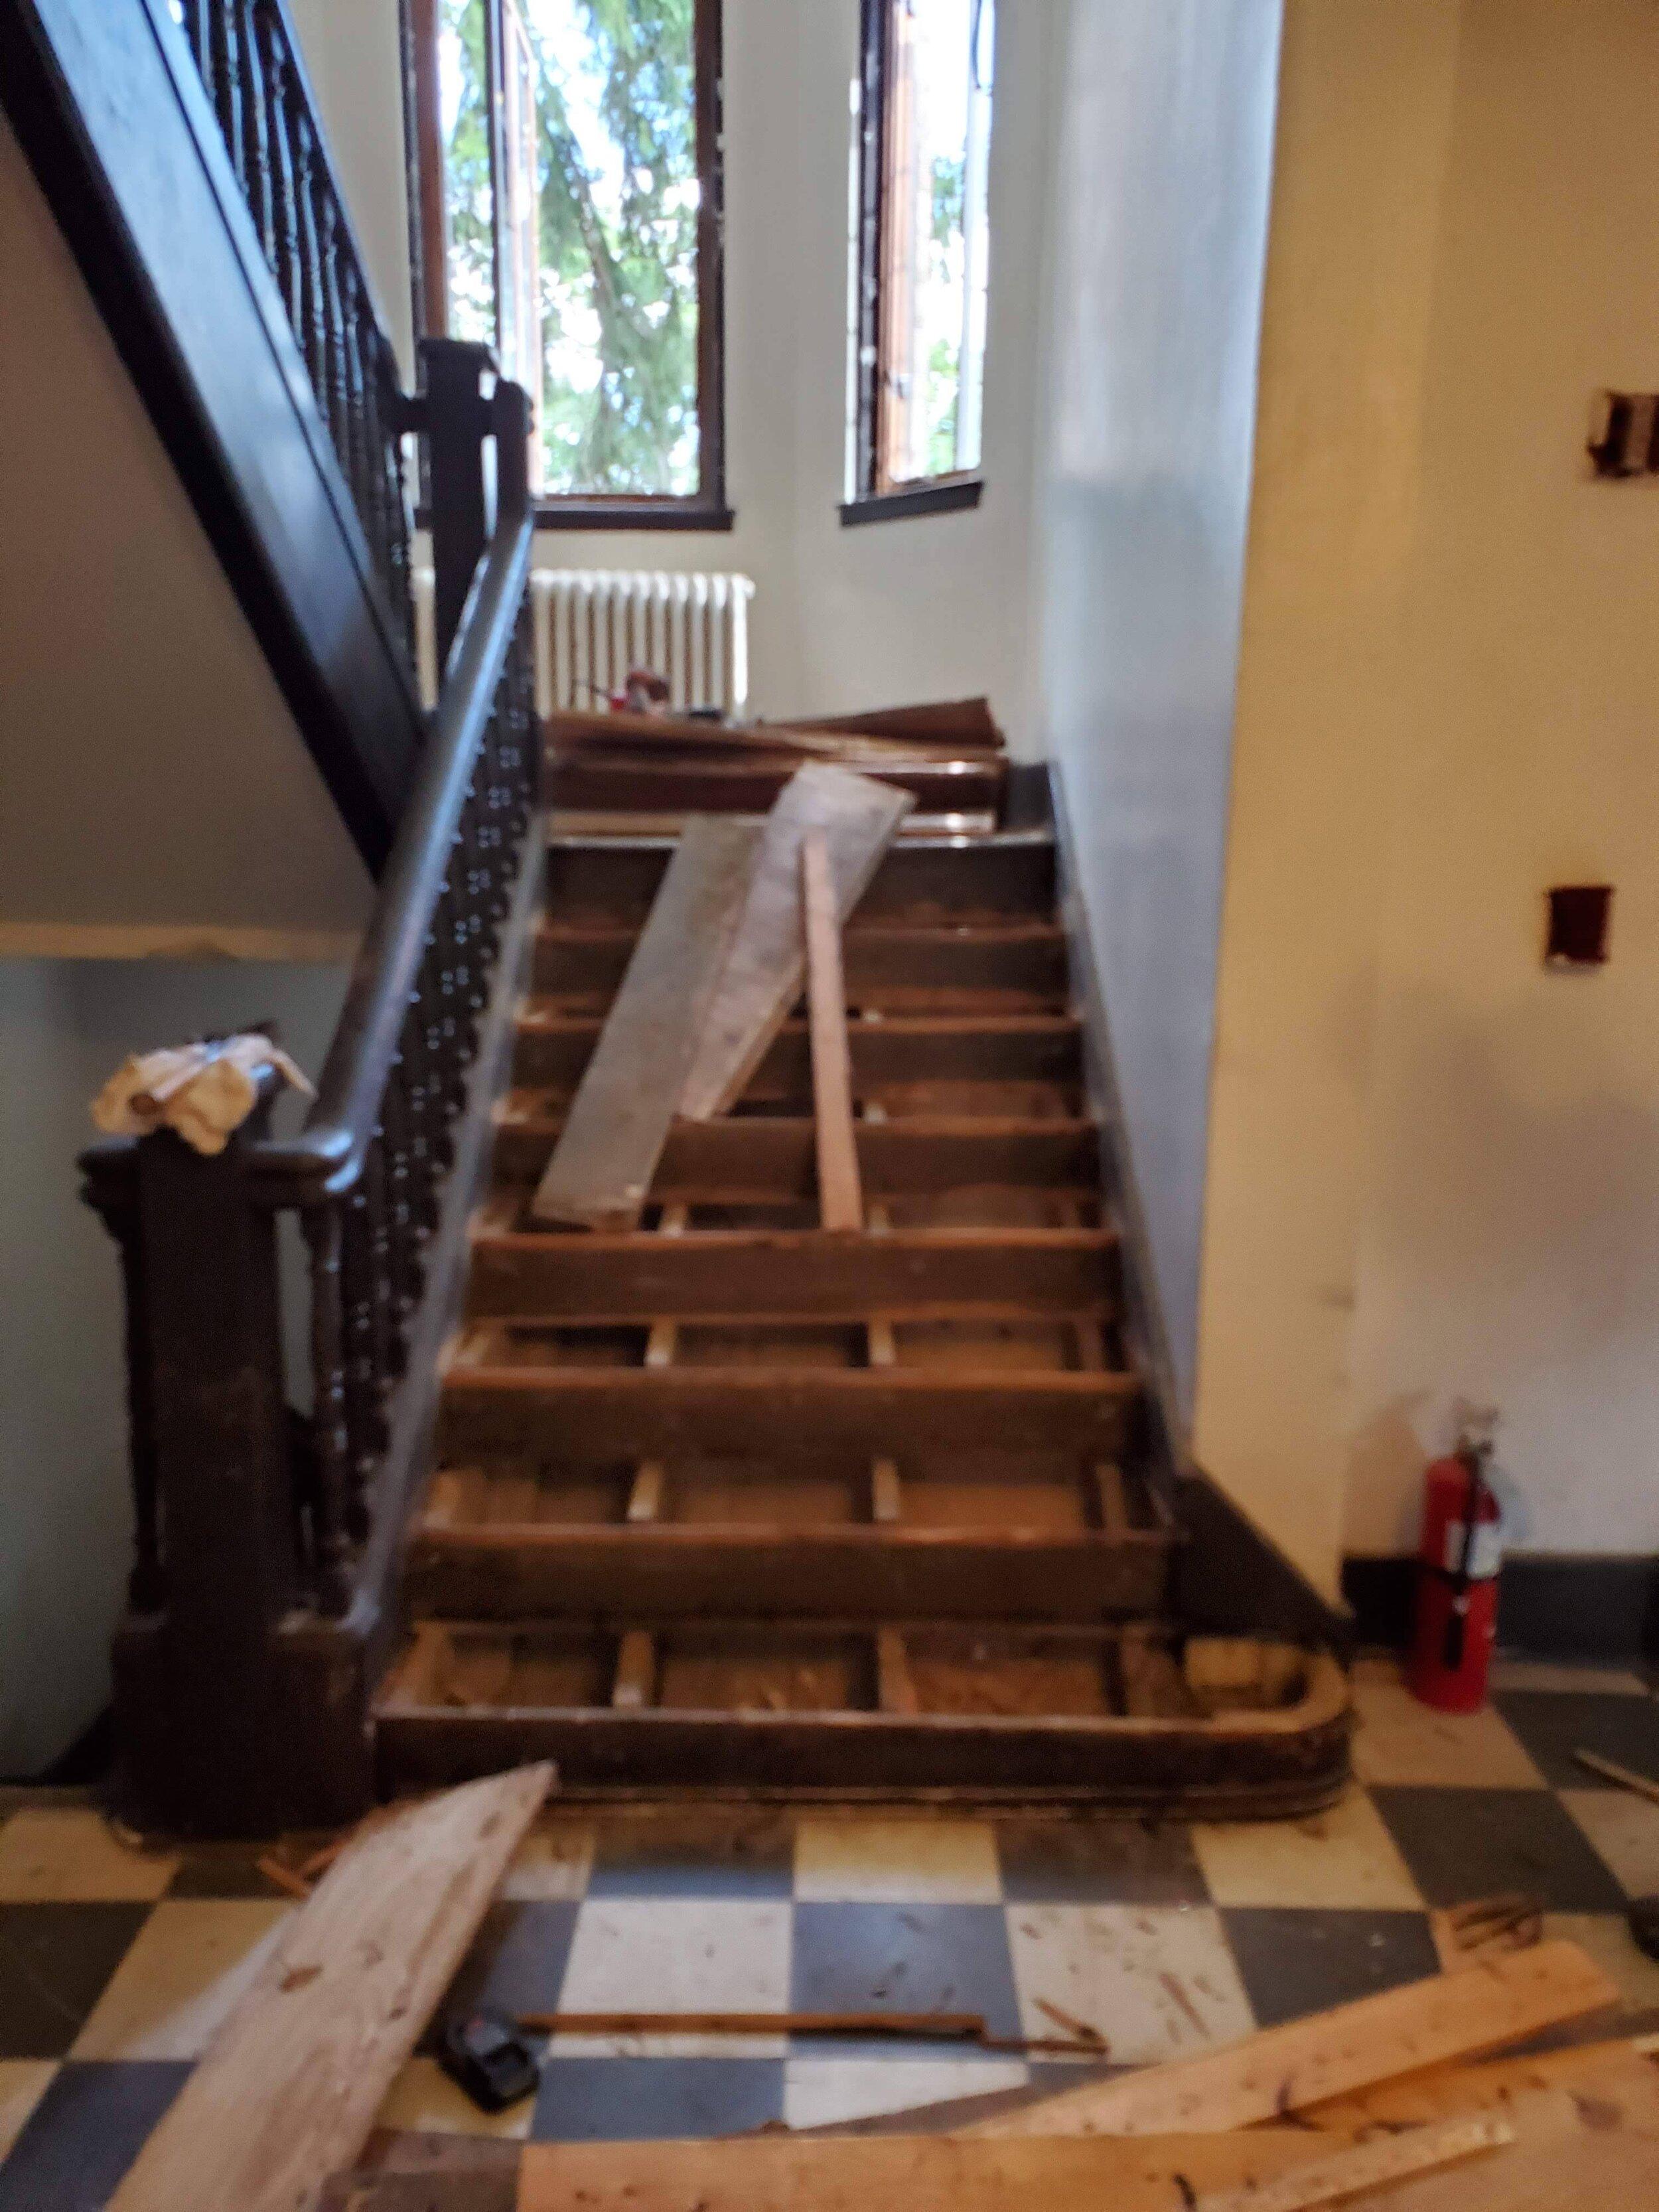 2019 First Floor Front Stair Renovation 20190819_123422.jpg